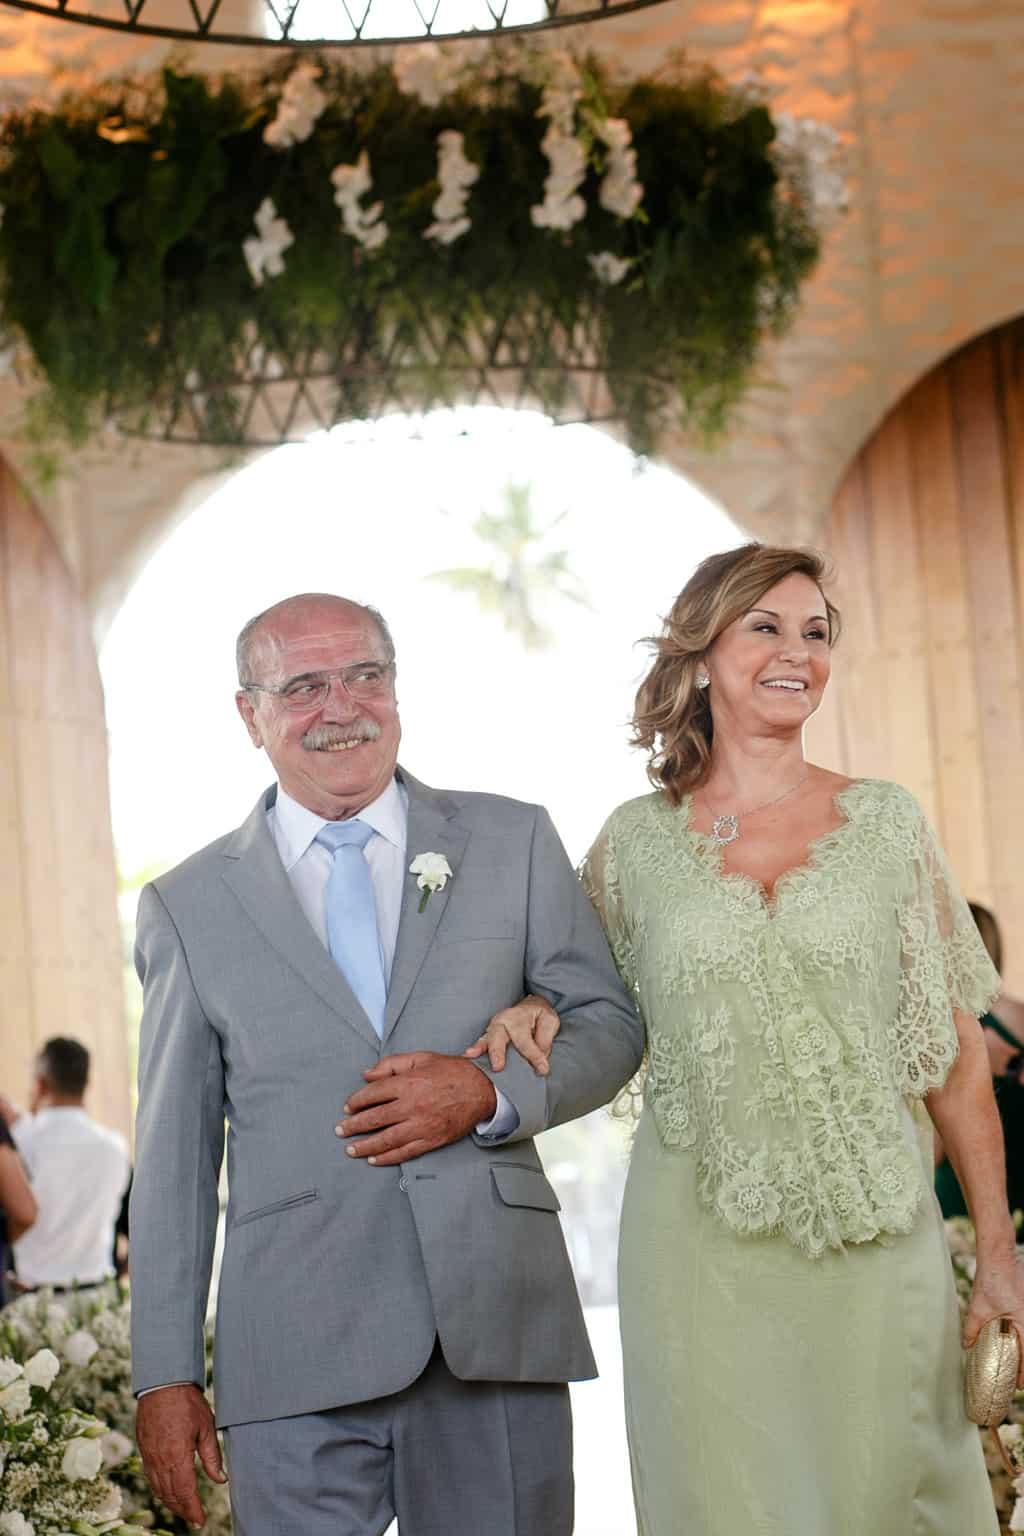 AL-Aline-e-Mauricio-capela-dos-milagres-casamento-casamento-na-praia-mae-da-noiva-pai-do-noivo69